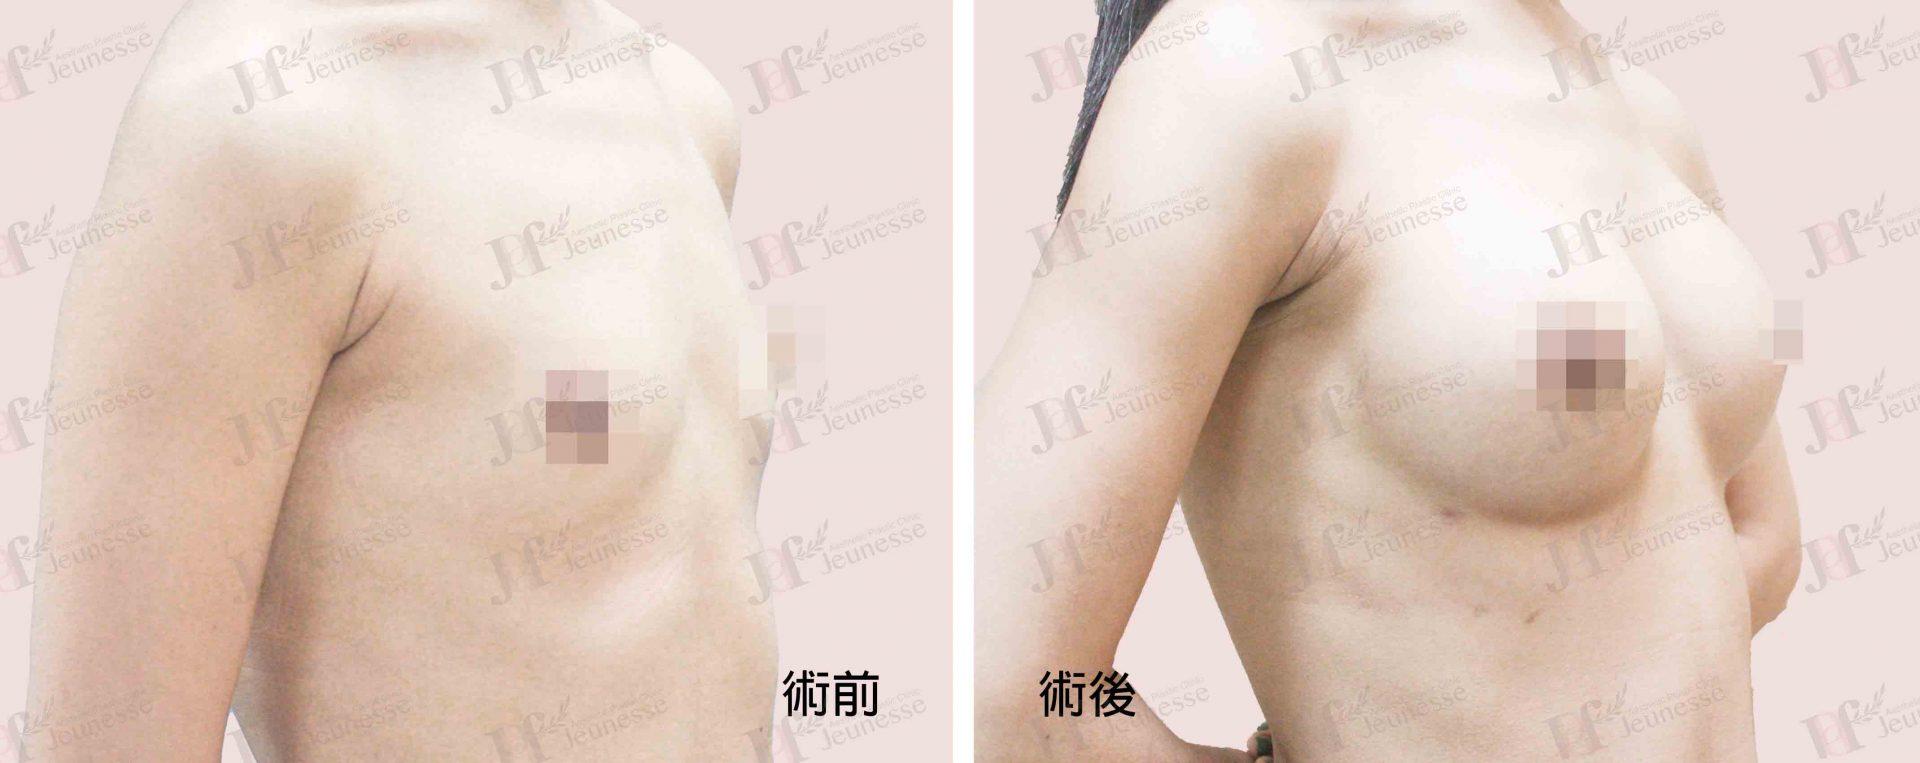 Breast Augmentation- Silicone implants -case3 45度-浮水印